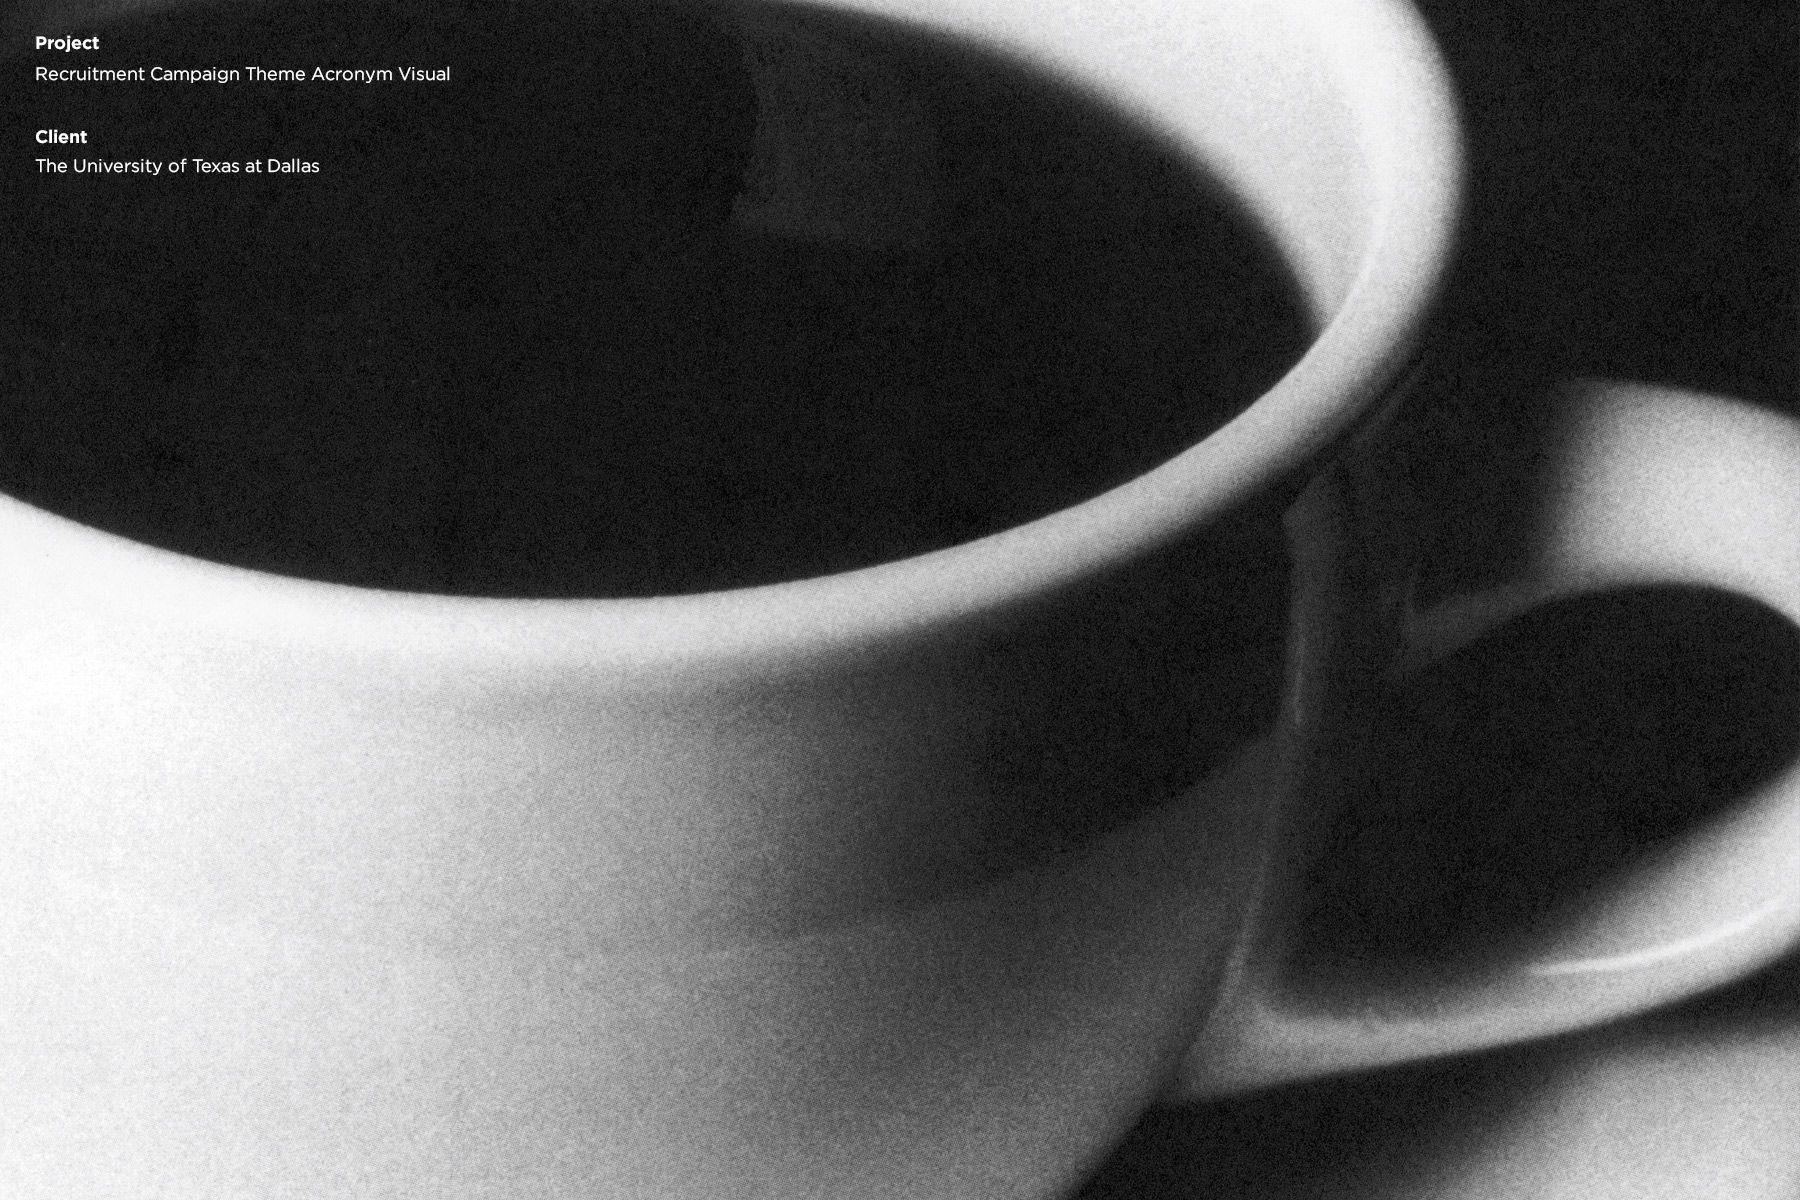 UTD-CoffeePic.jpg